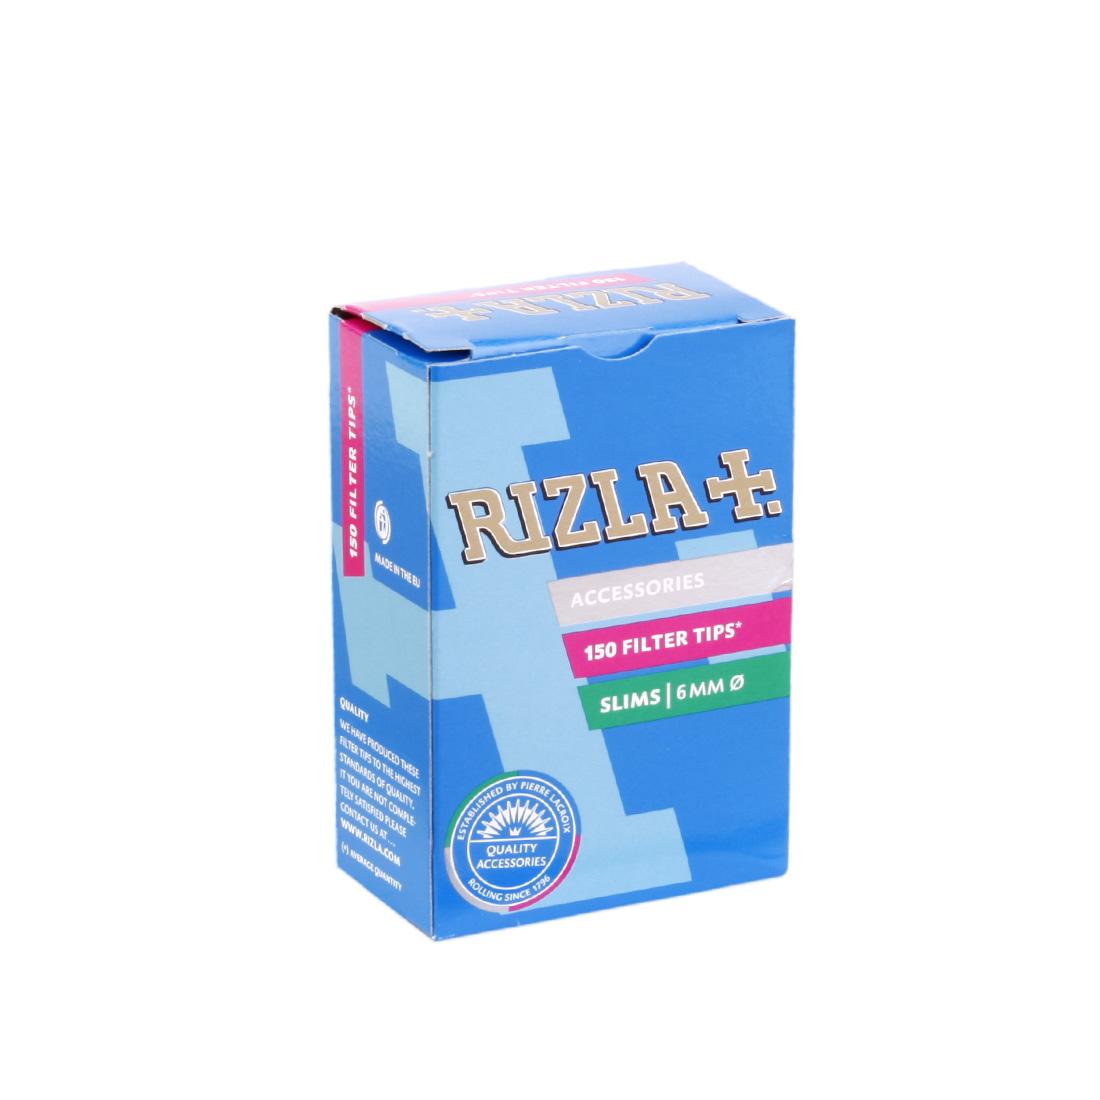 Fi-Rizla-boite_bis